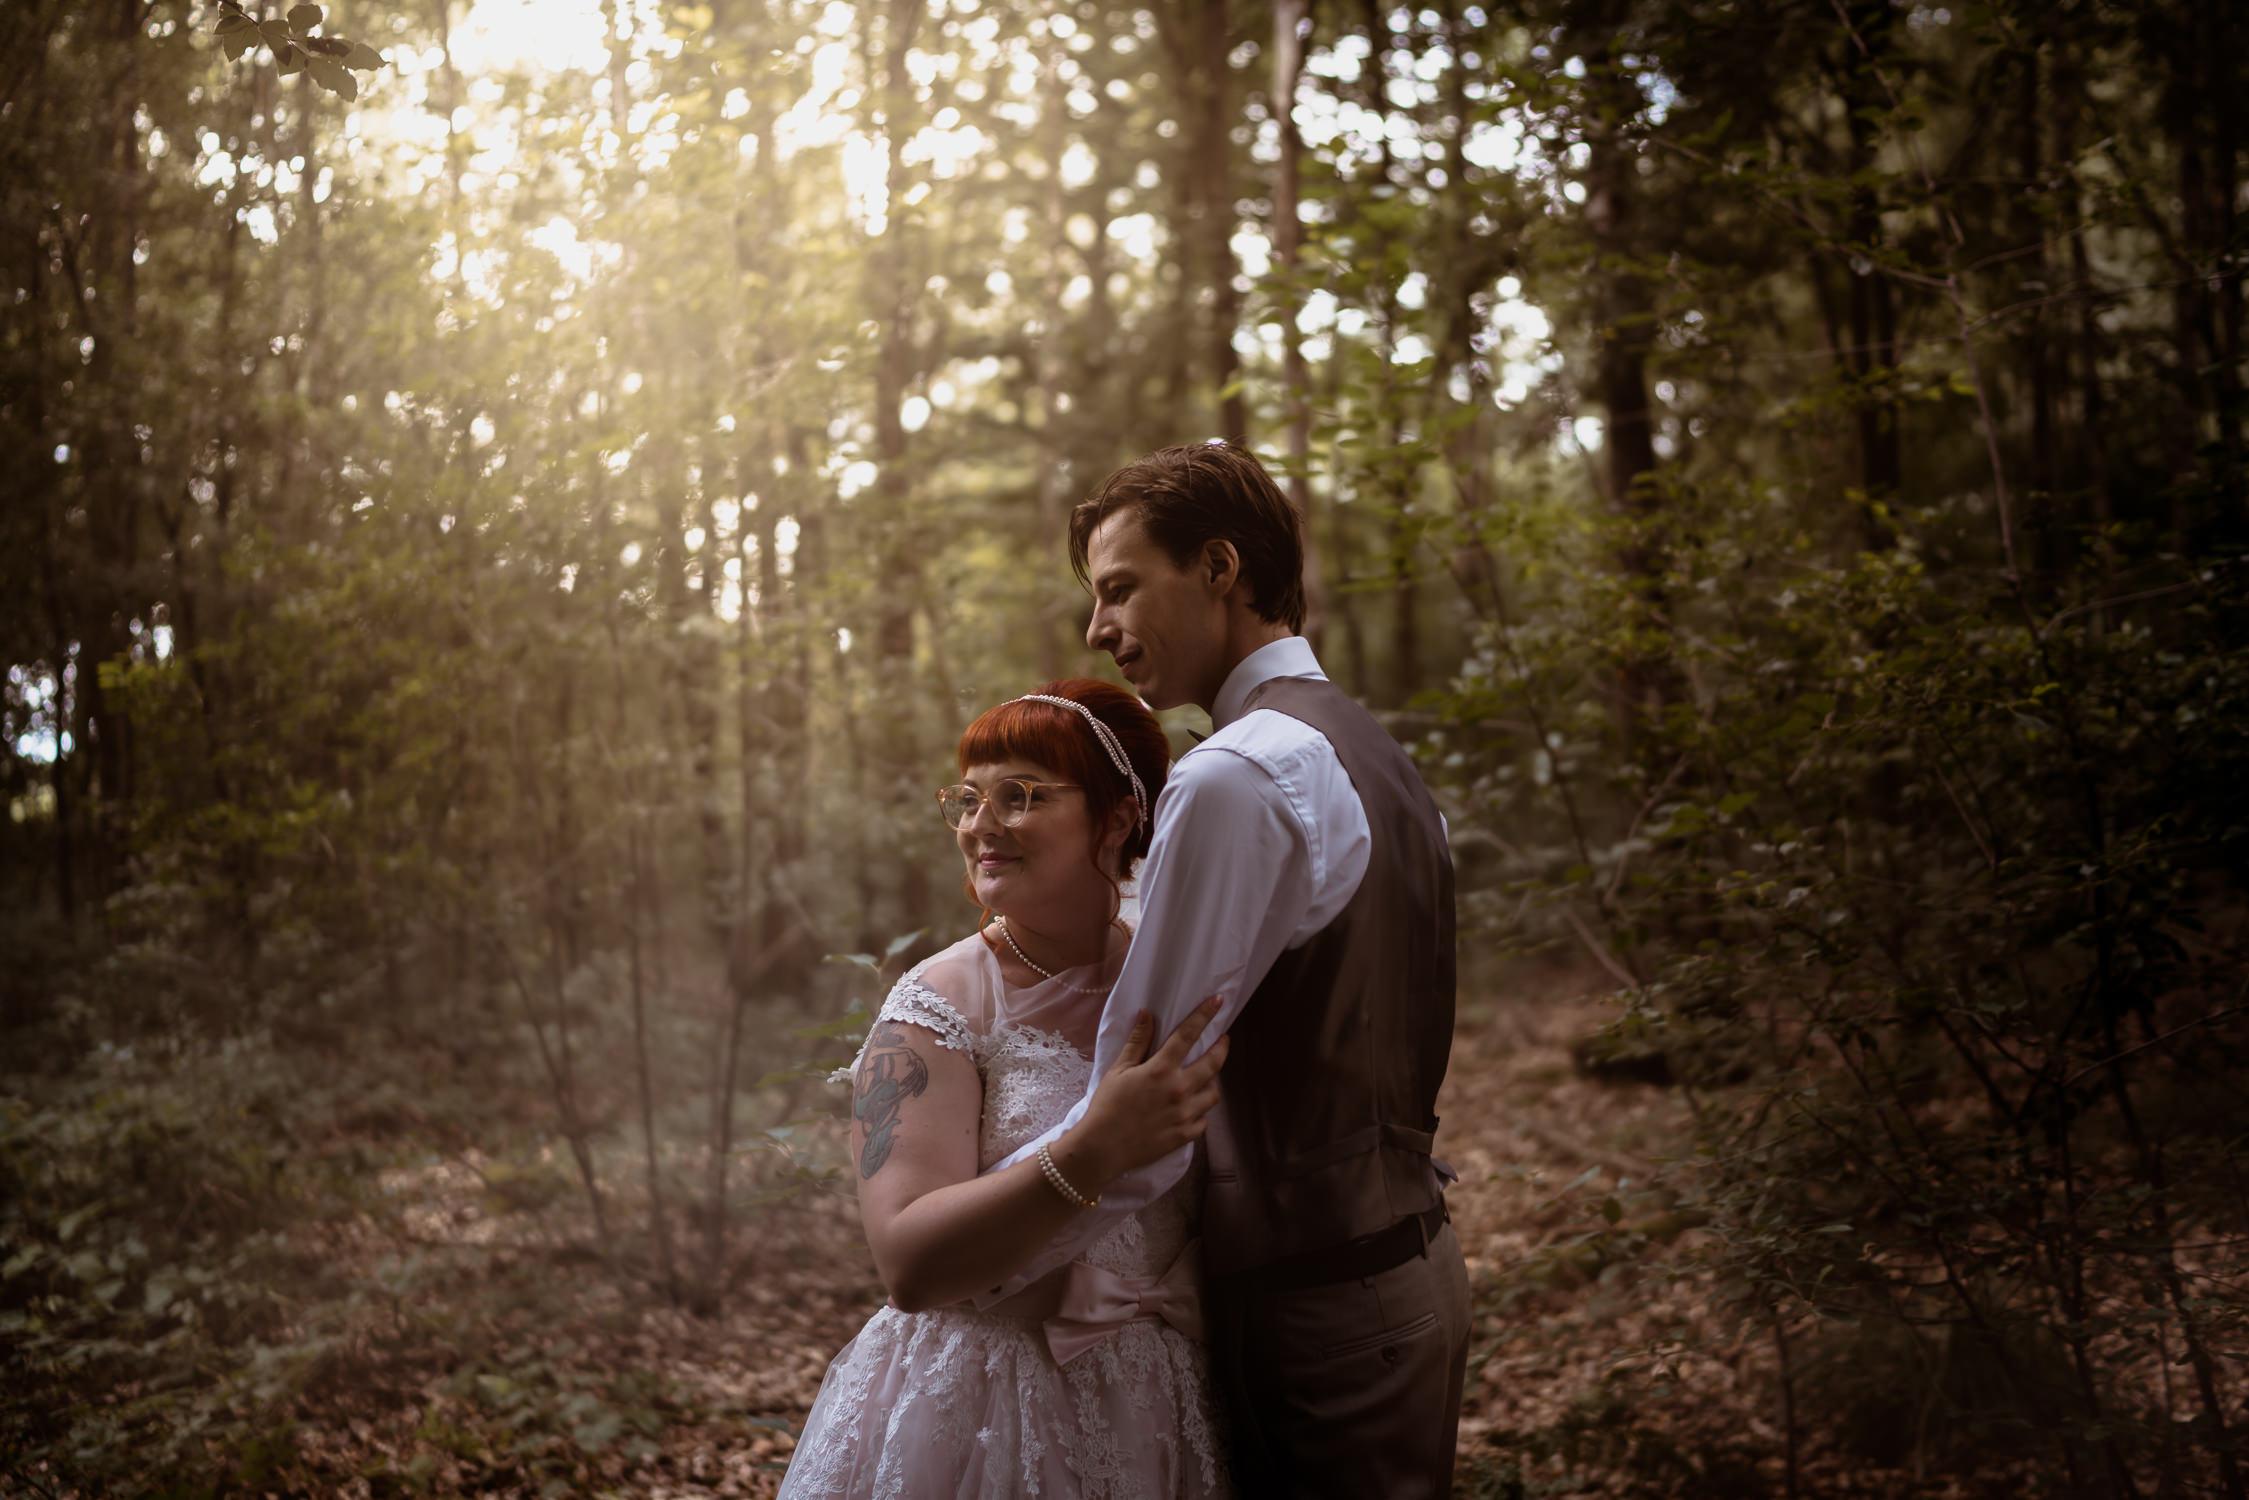 beste-bruidsfotografie-amsterdam-utrecht-bruidspaar-verliefd